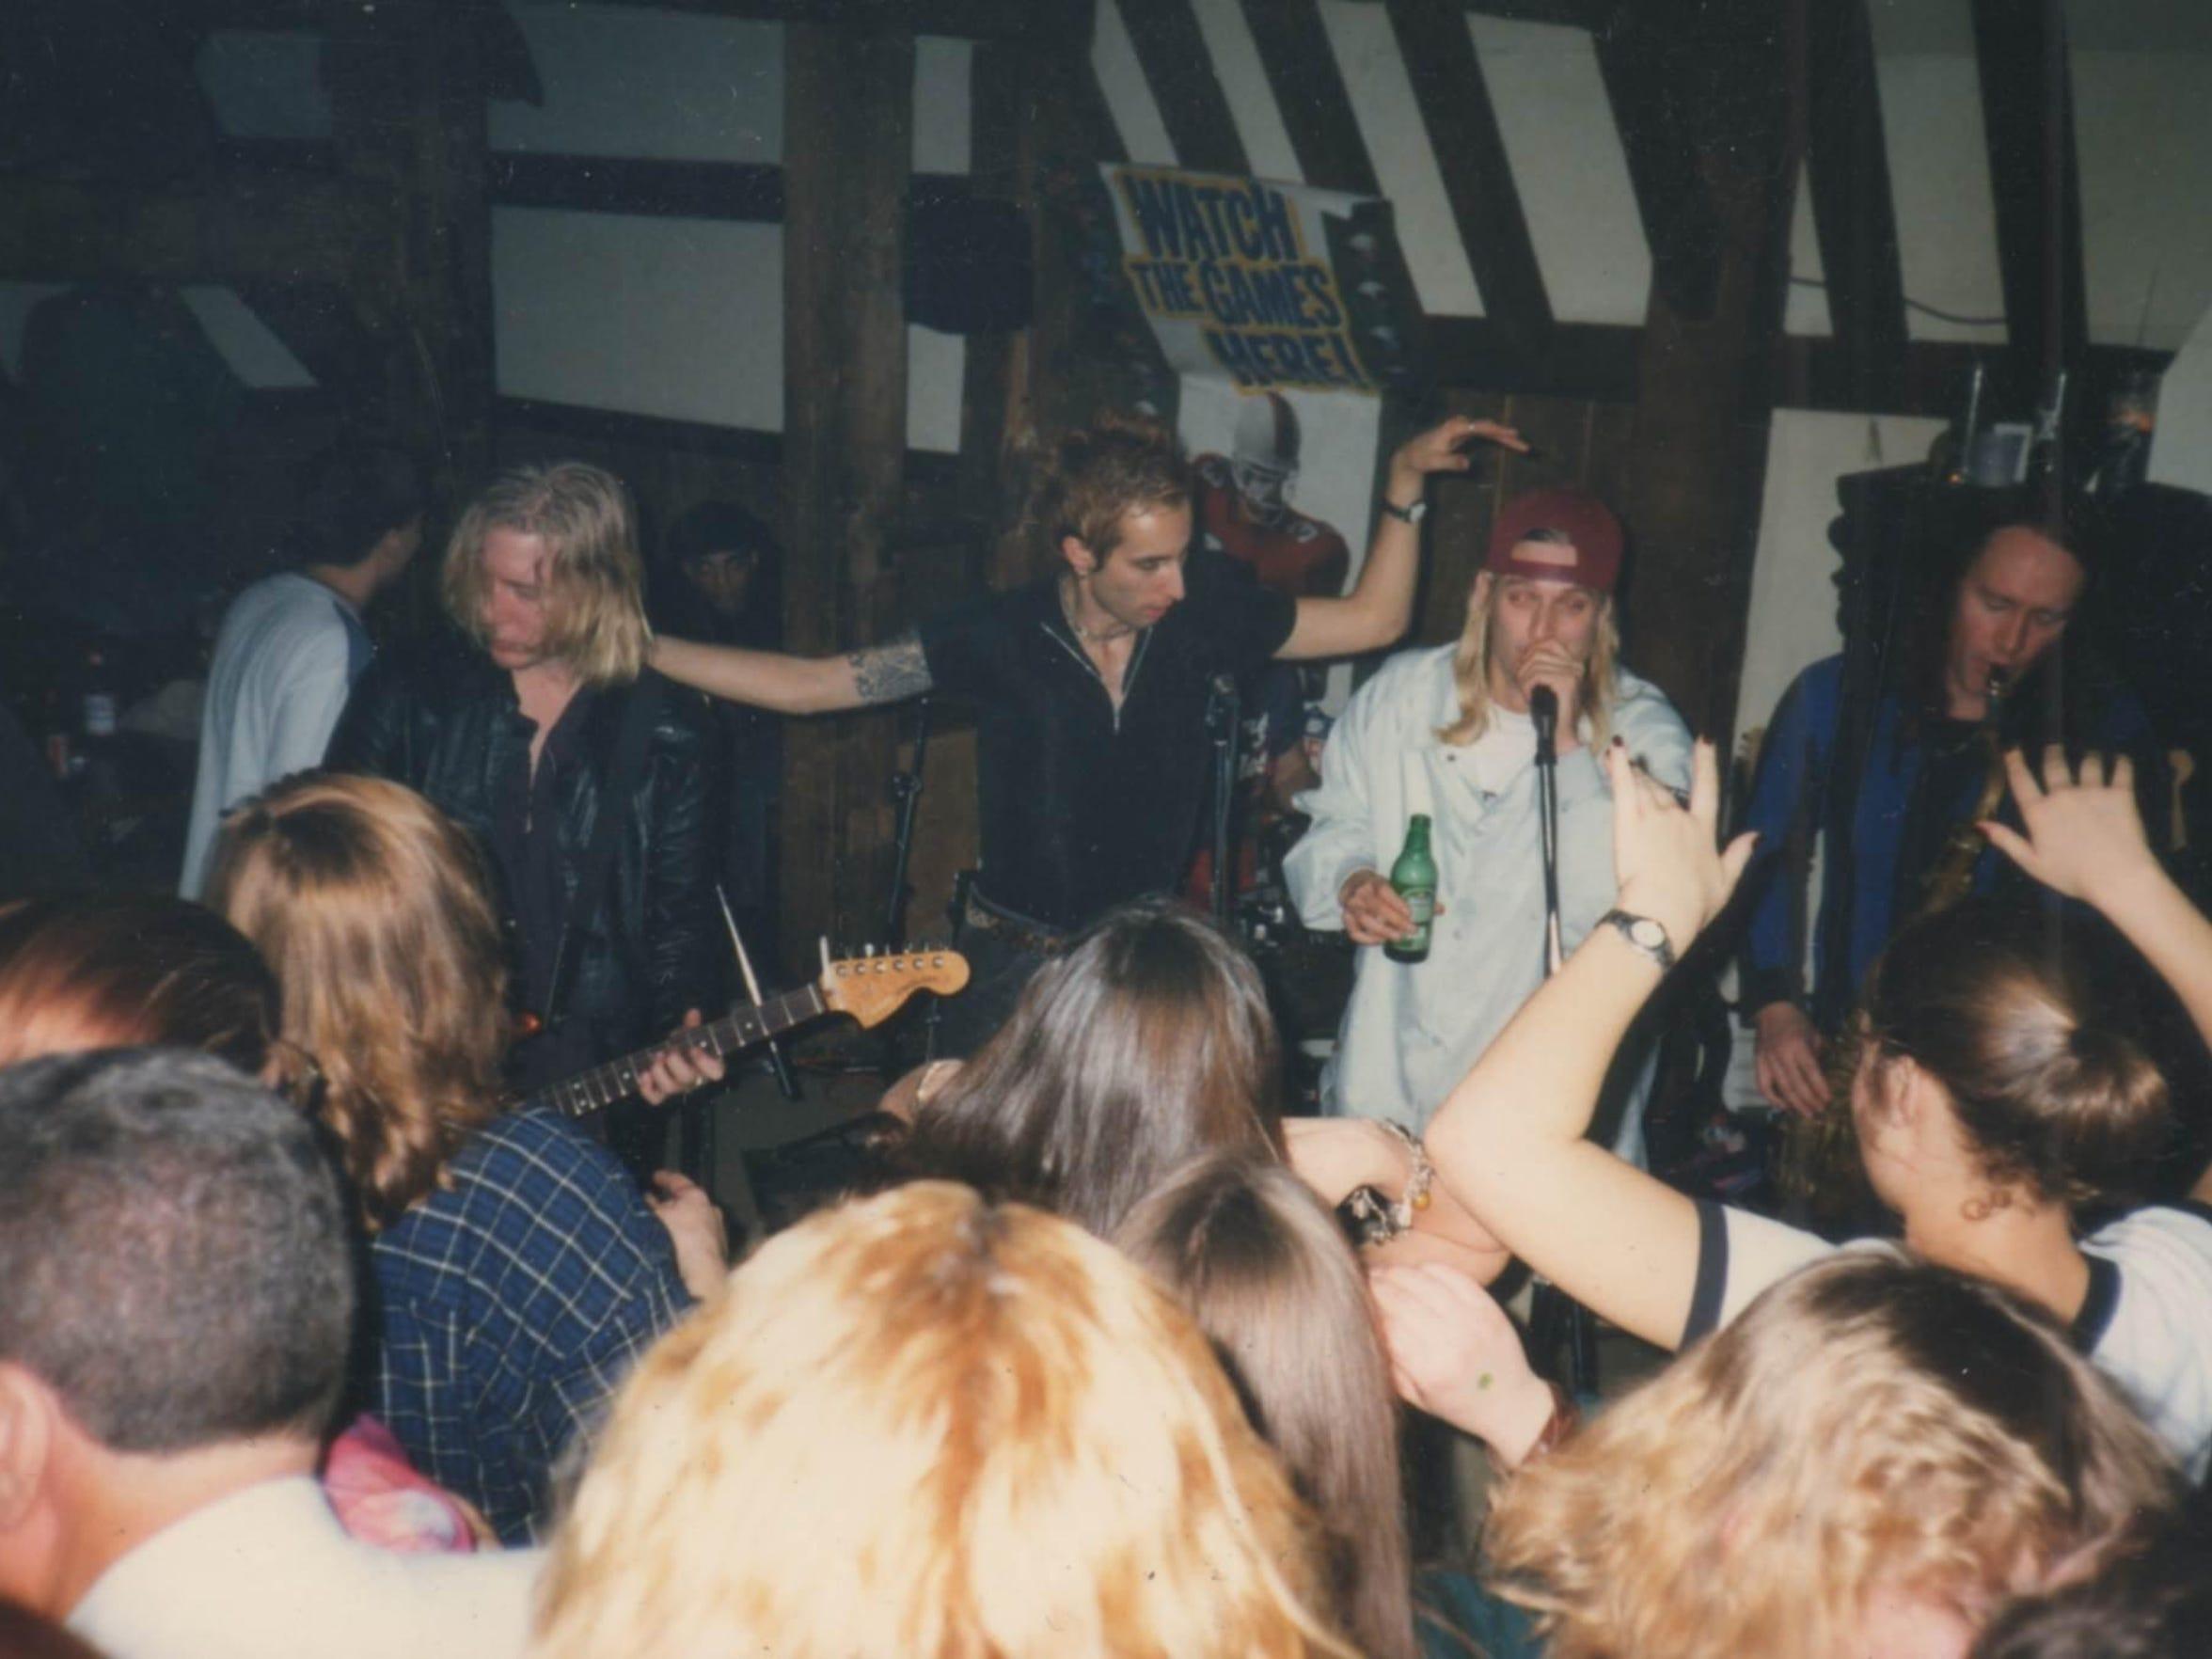 Jam sessions in the mid-'90s at the Bear's Den in Berkley